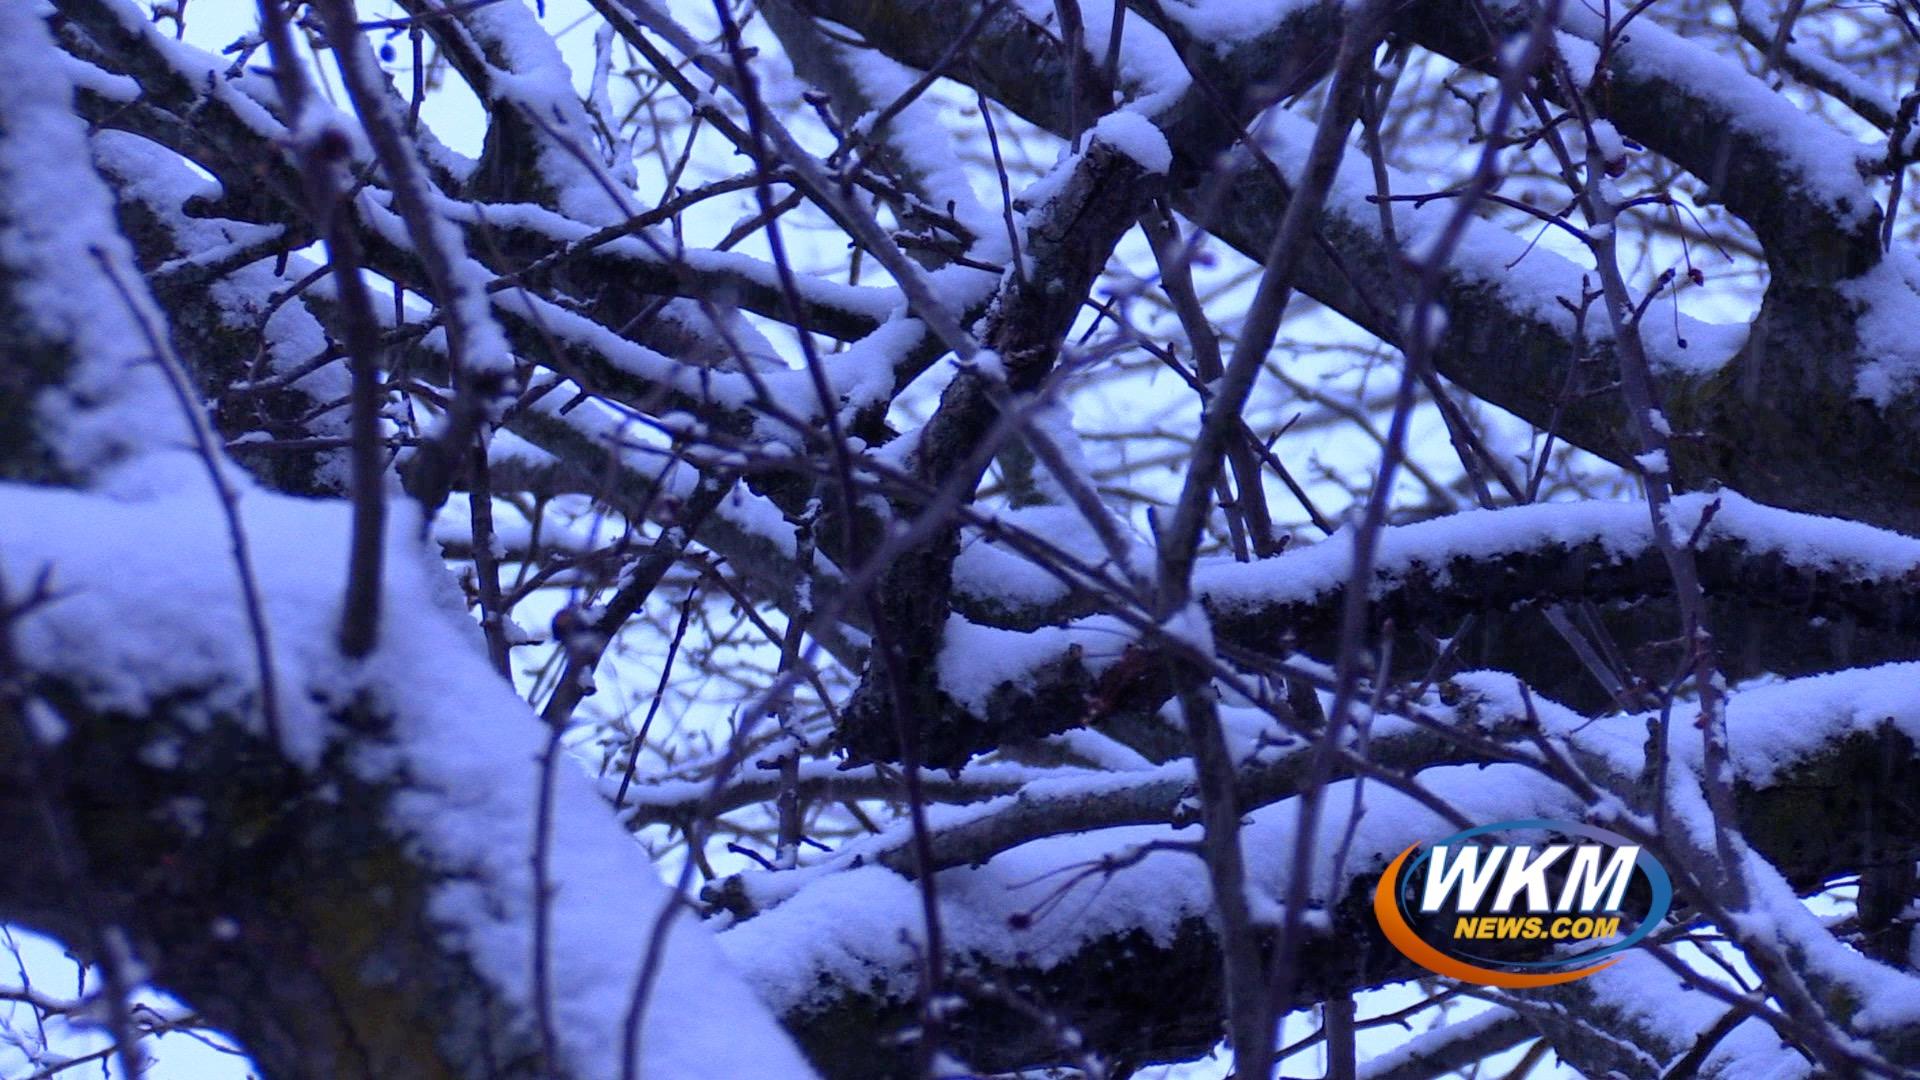 Weather Advisory for Snowy Wednesday